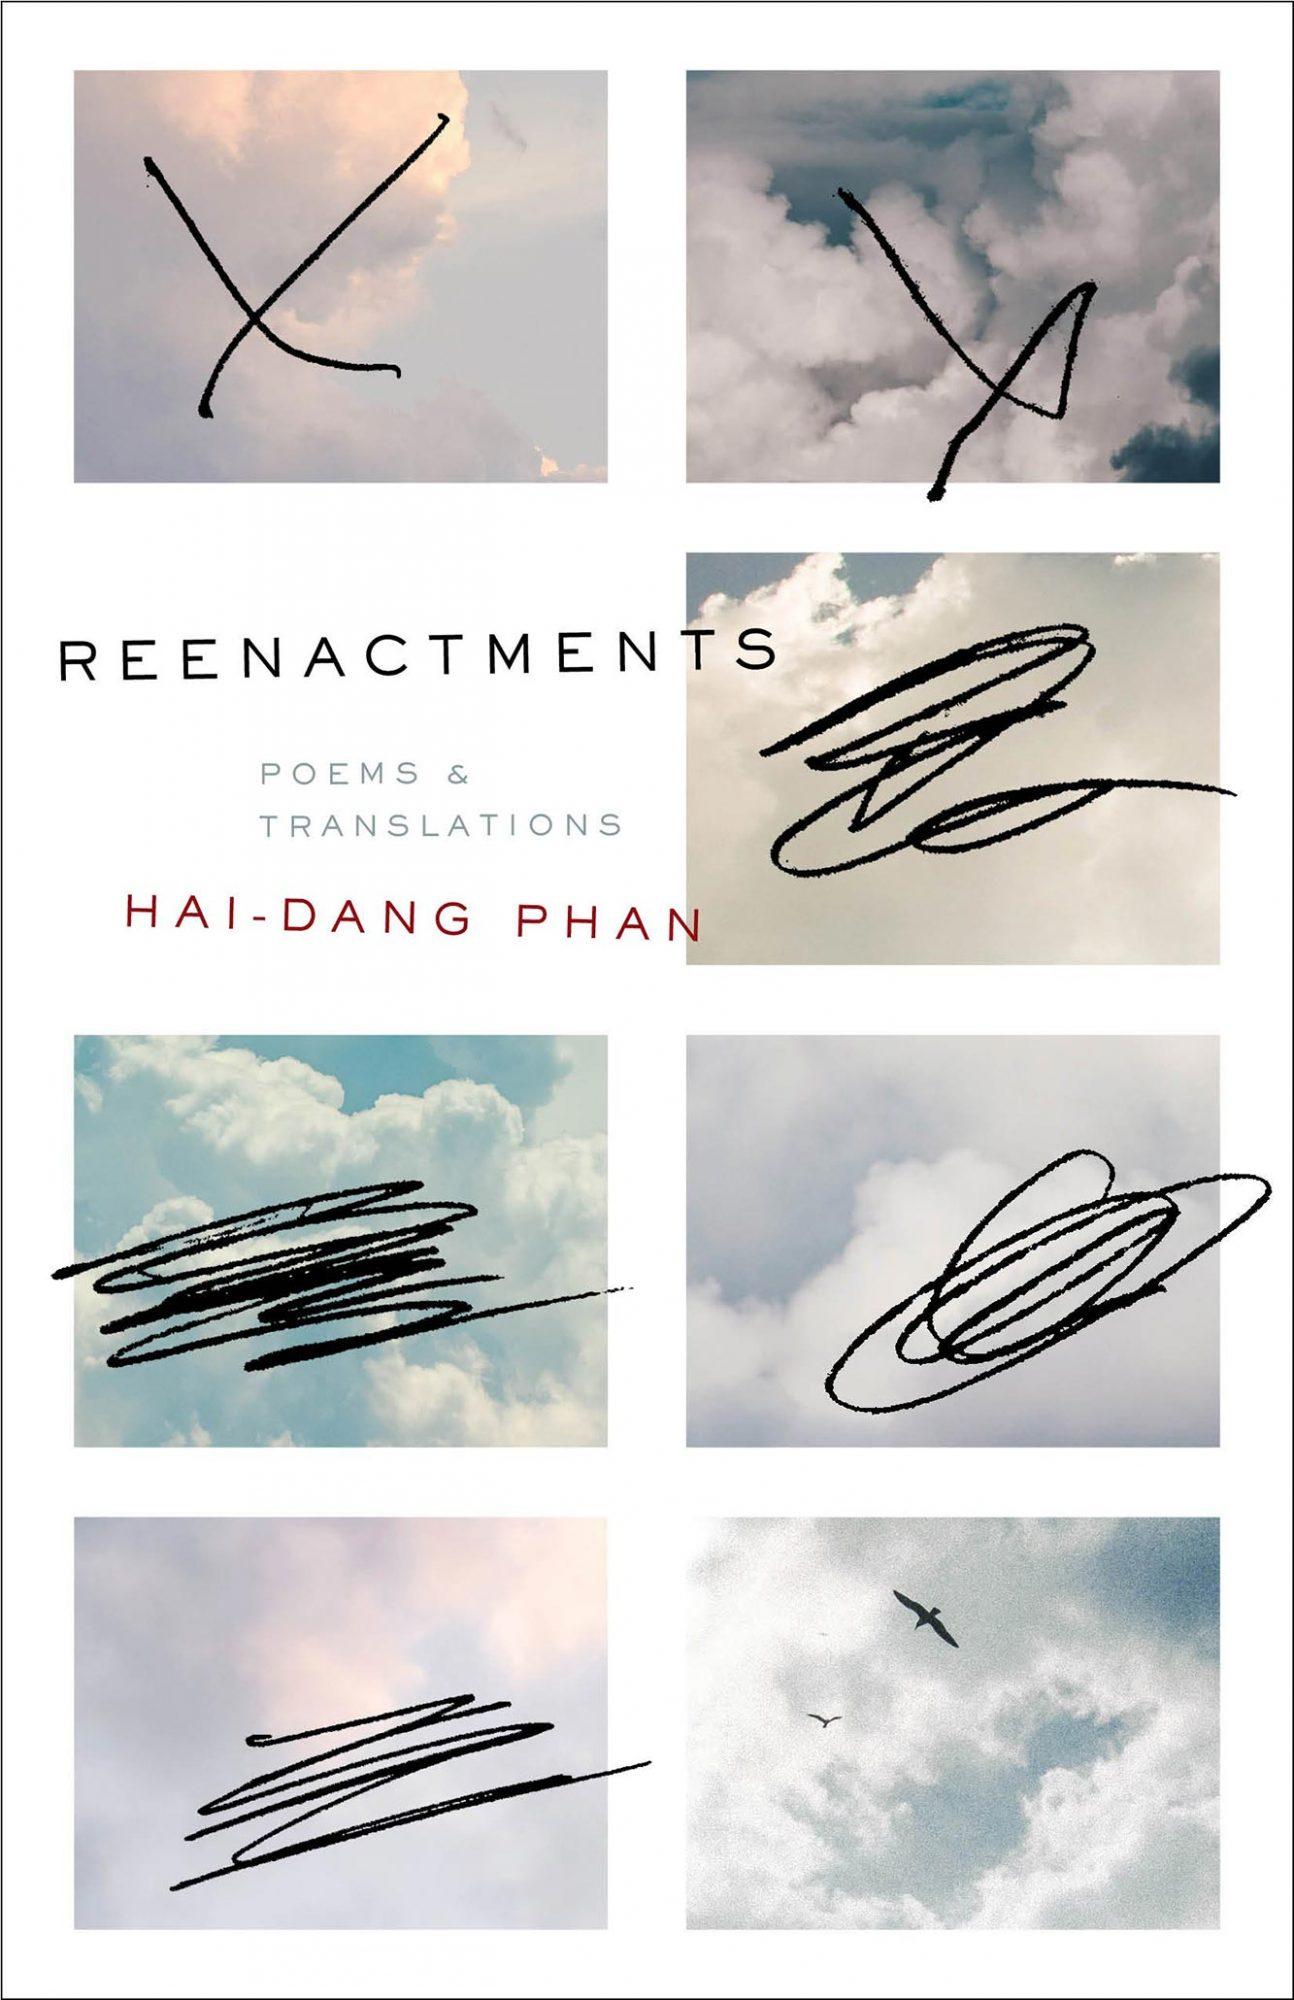 AAPI Books Reenactments: Poems & Translations, by Hai-Dang Phan